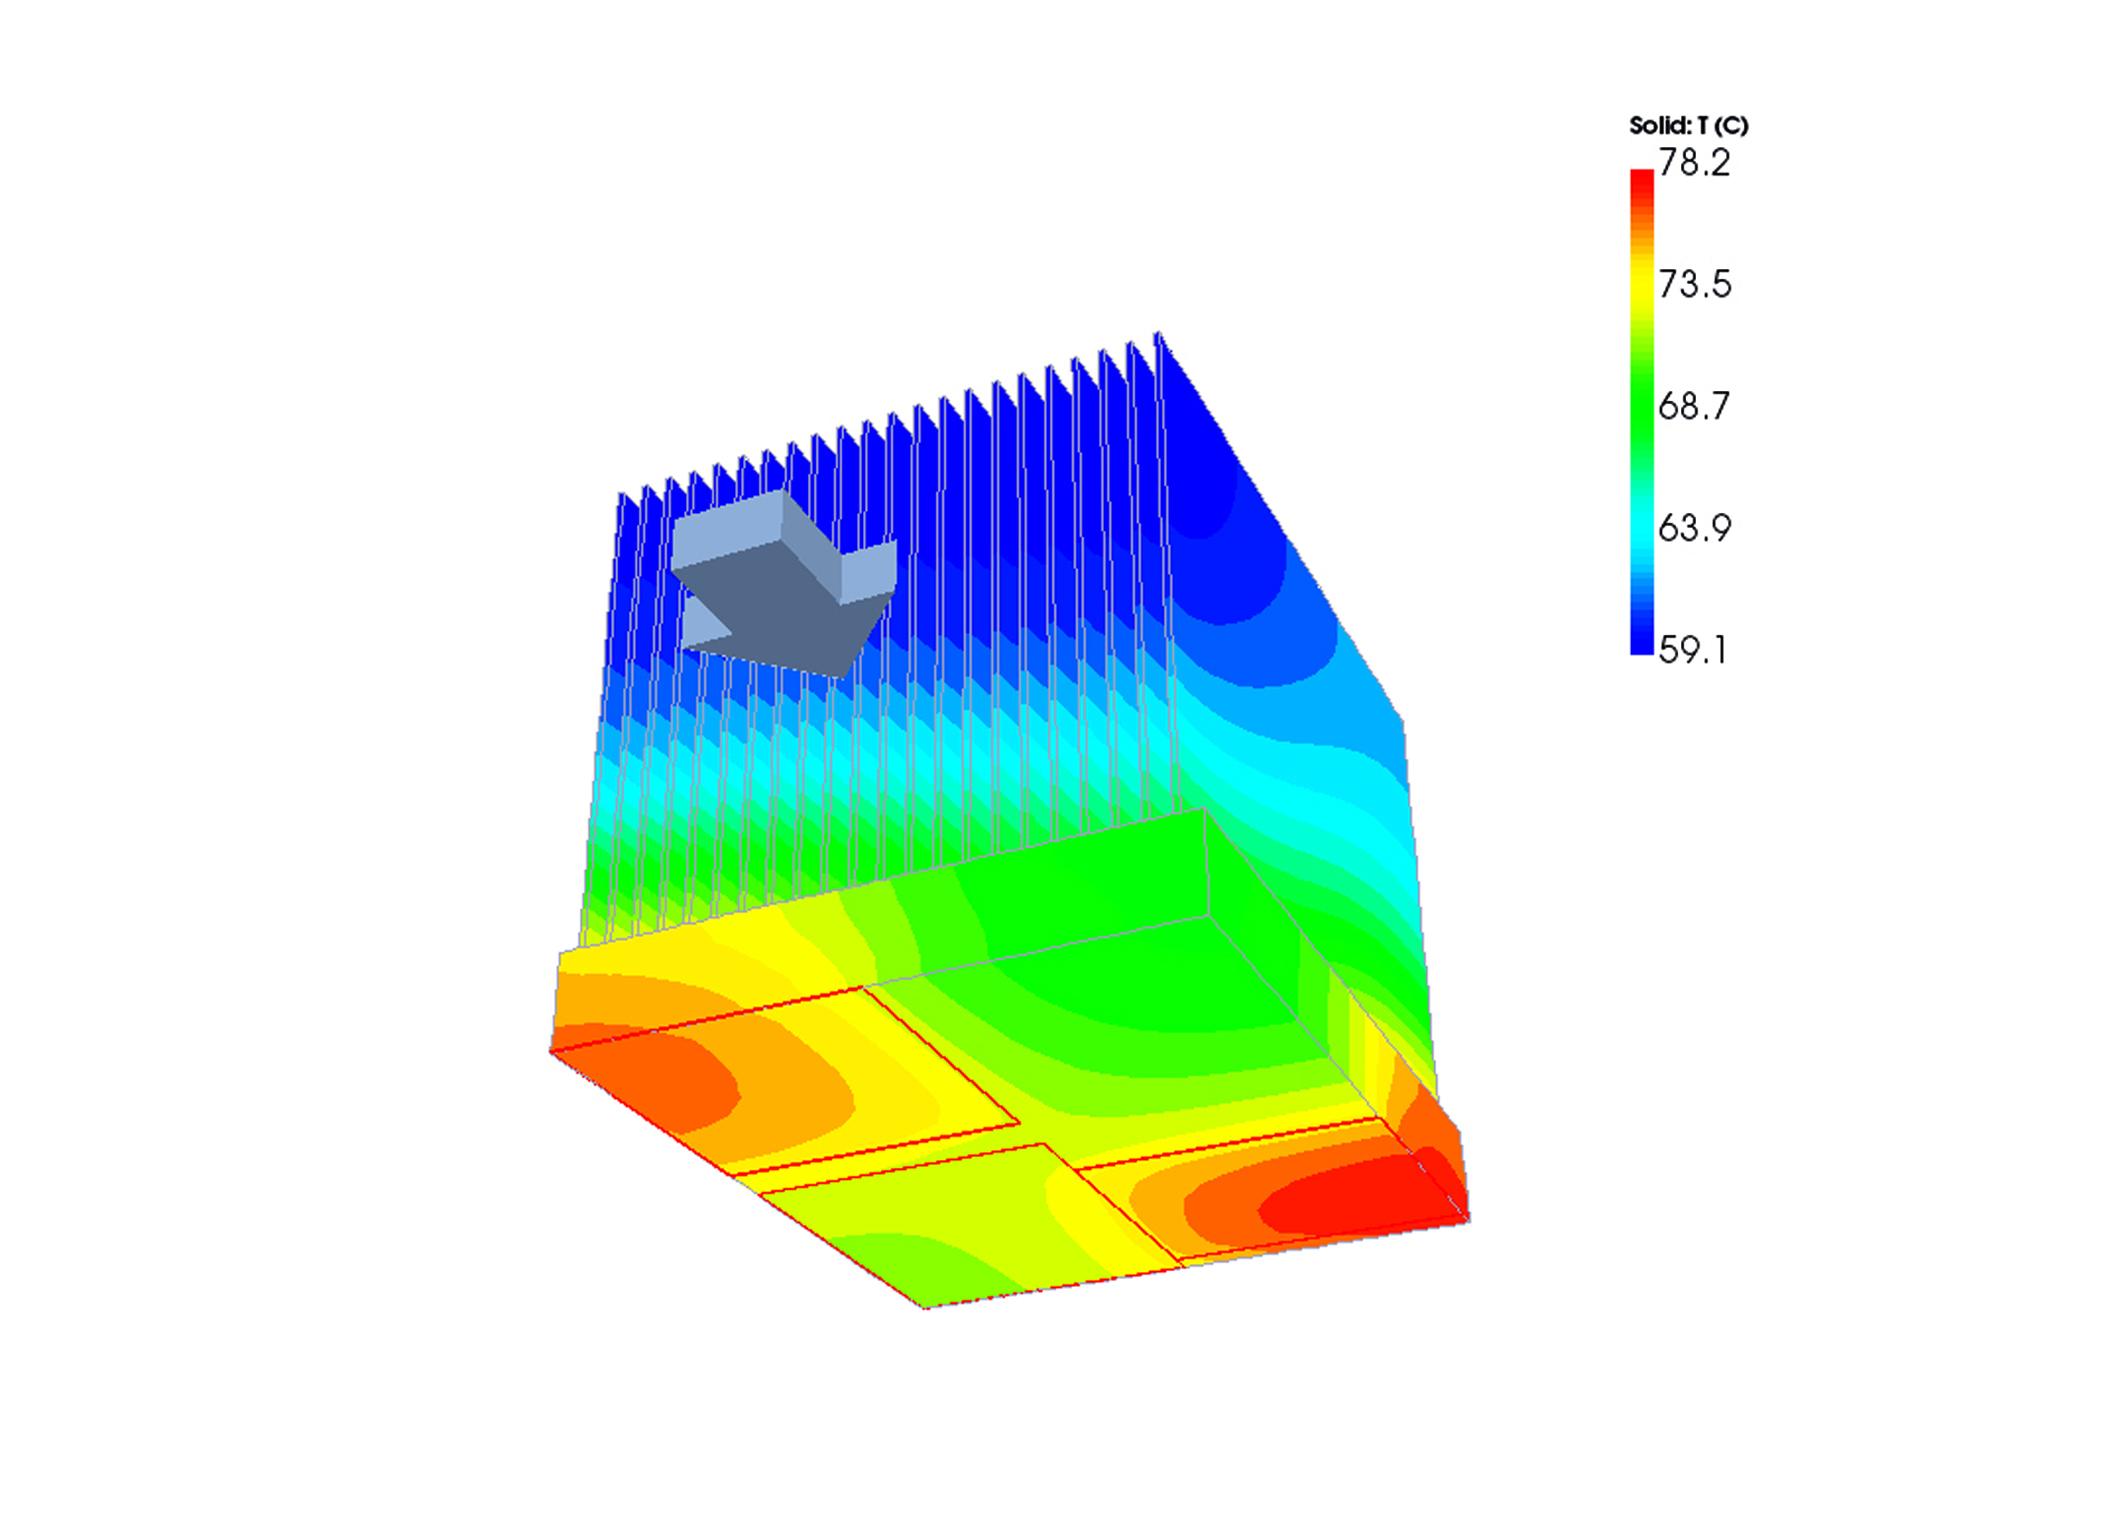 Mersen heat sink calculator R-TOOLS MAXX